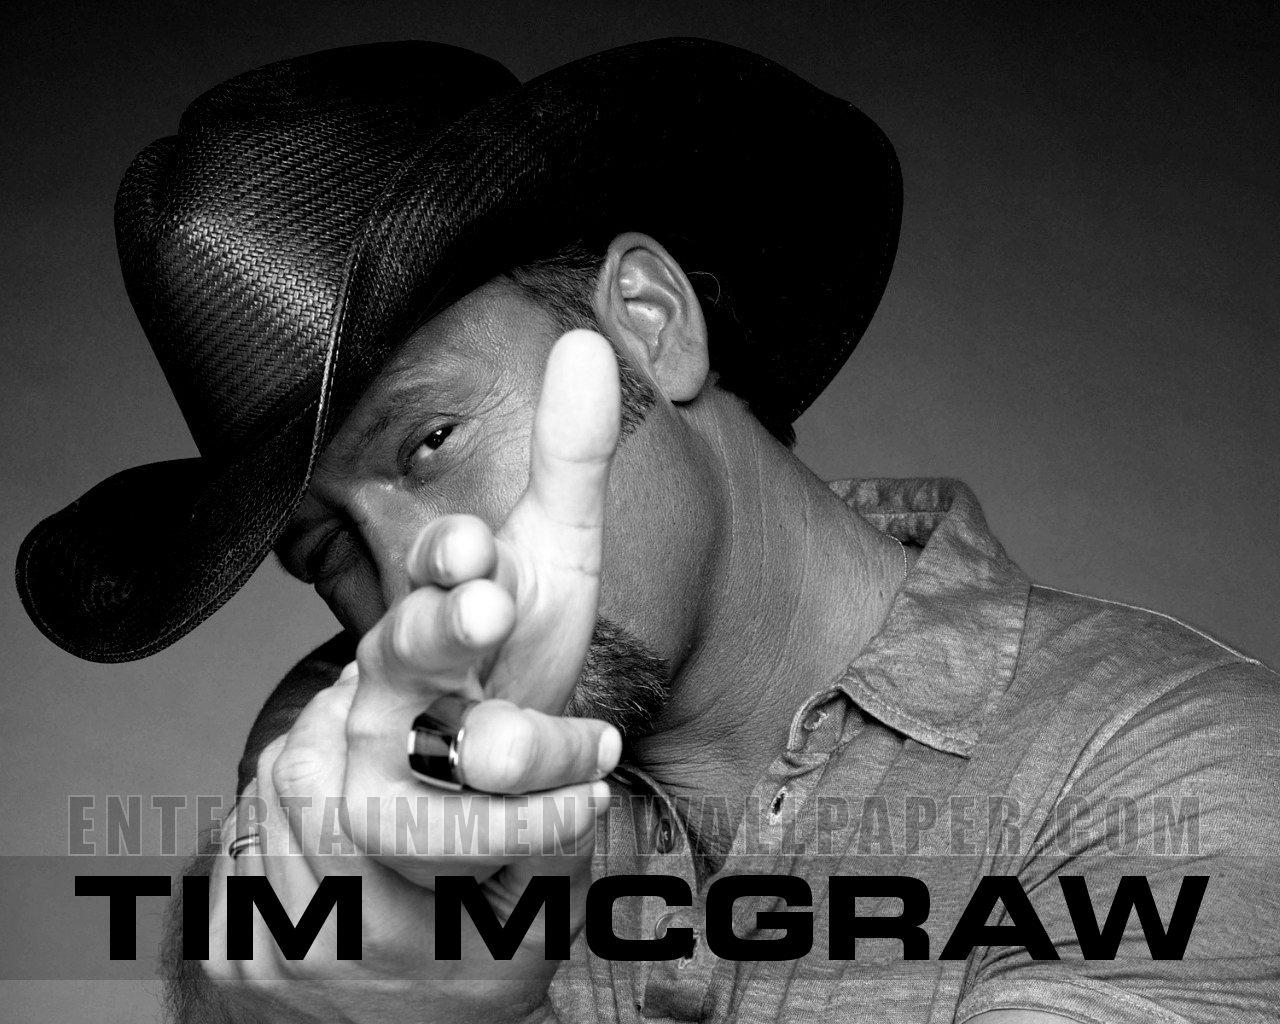 Tim McGraw Wallpaper   40035116 1280x1024 Desktop Download page 1280x1024